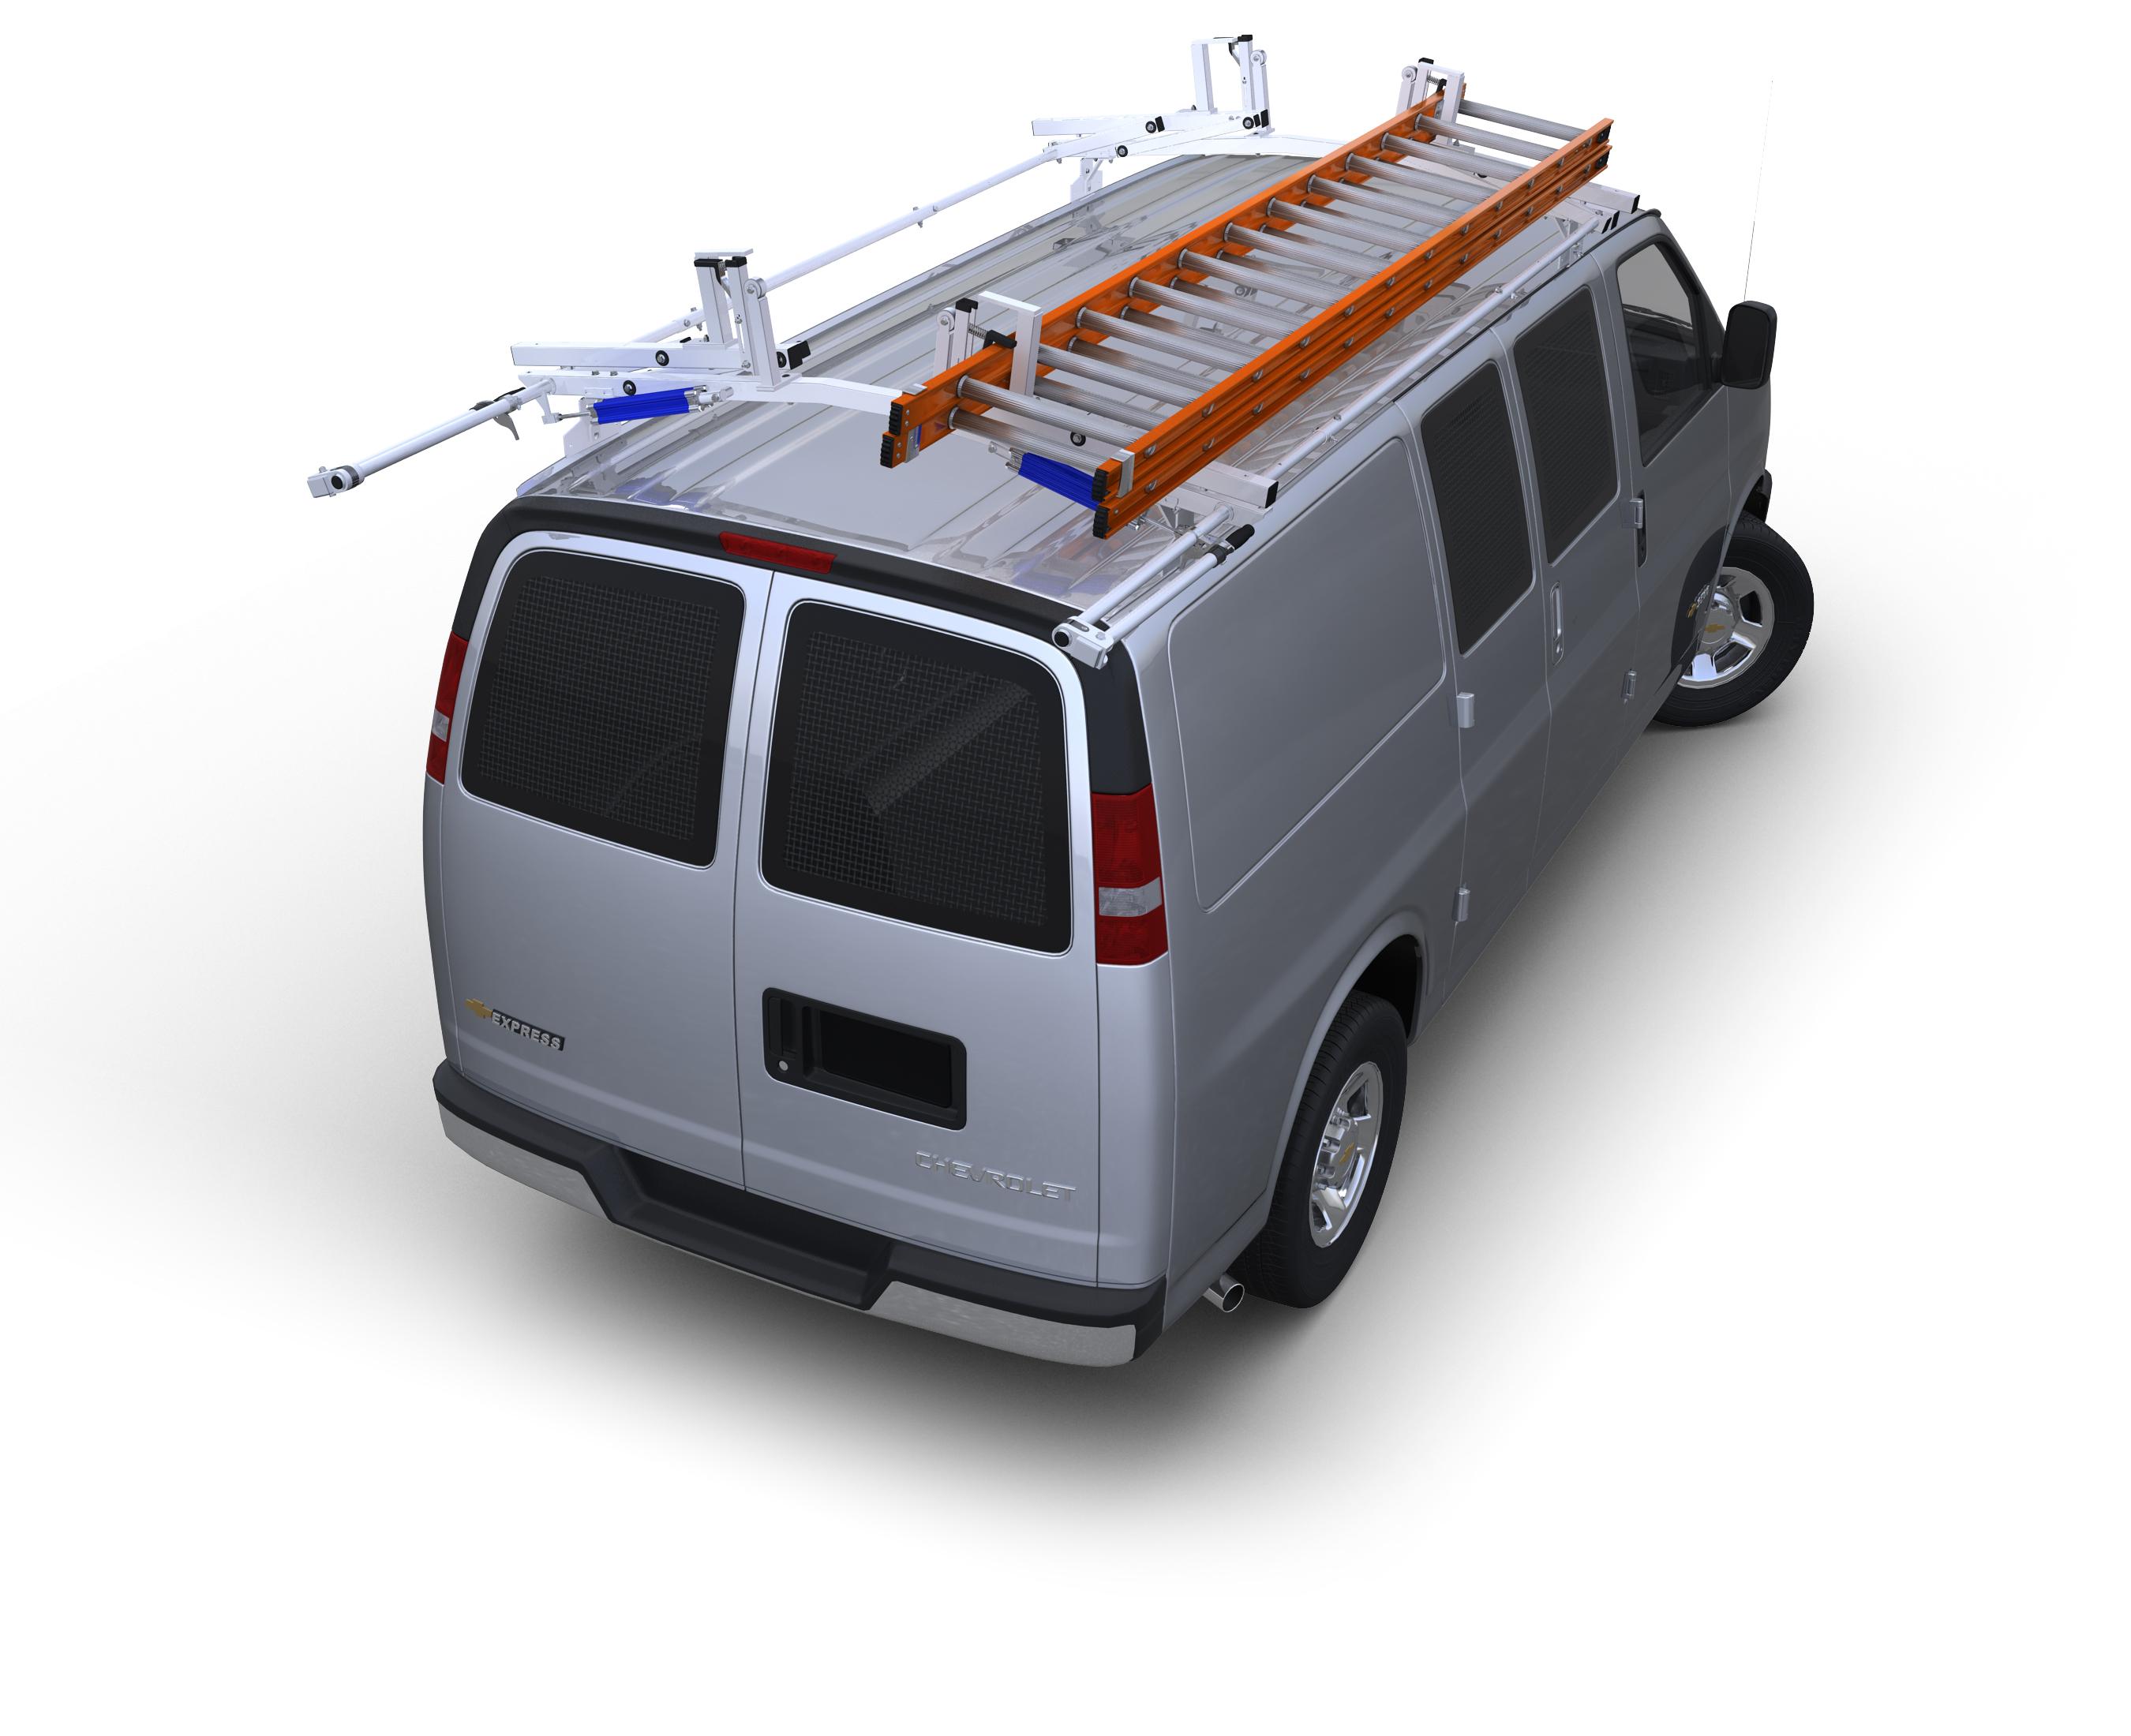 Topper Hot Dip Galvanized 12' Cargo Carrier Rack for the Nissan NV Standard Roof Van